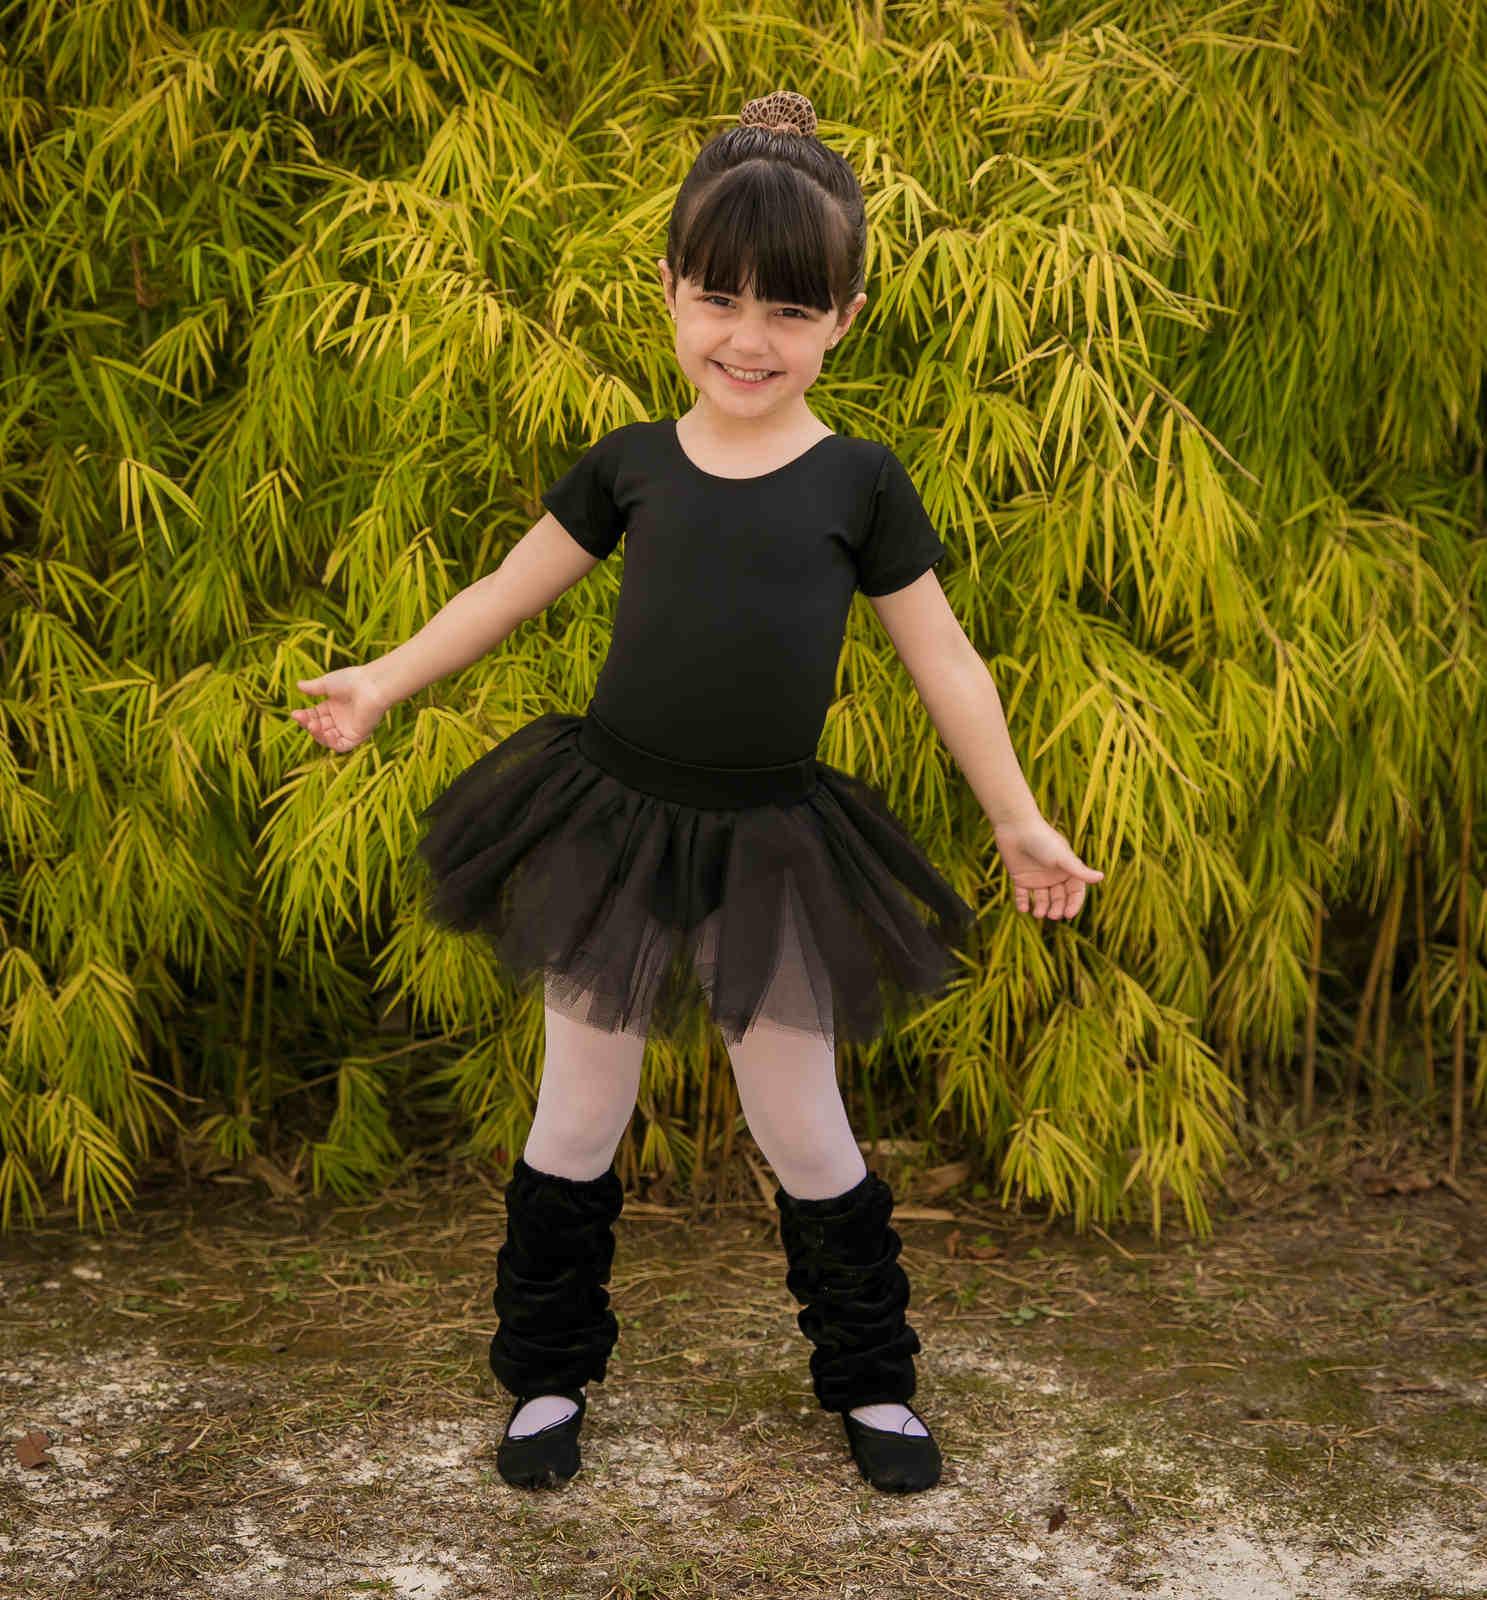 Collant Manga Curta Infantil para Ballet